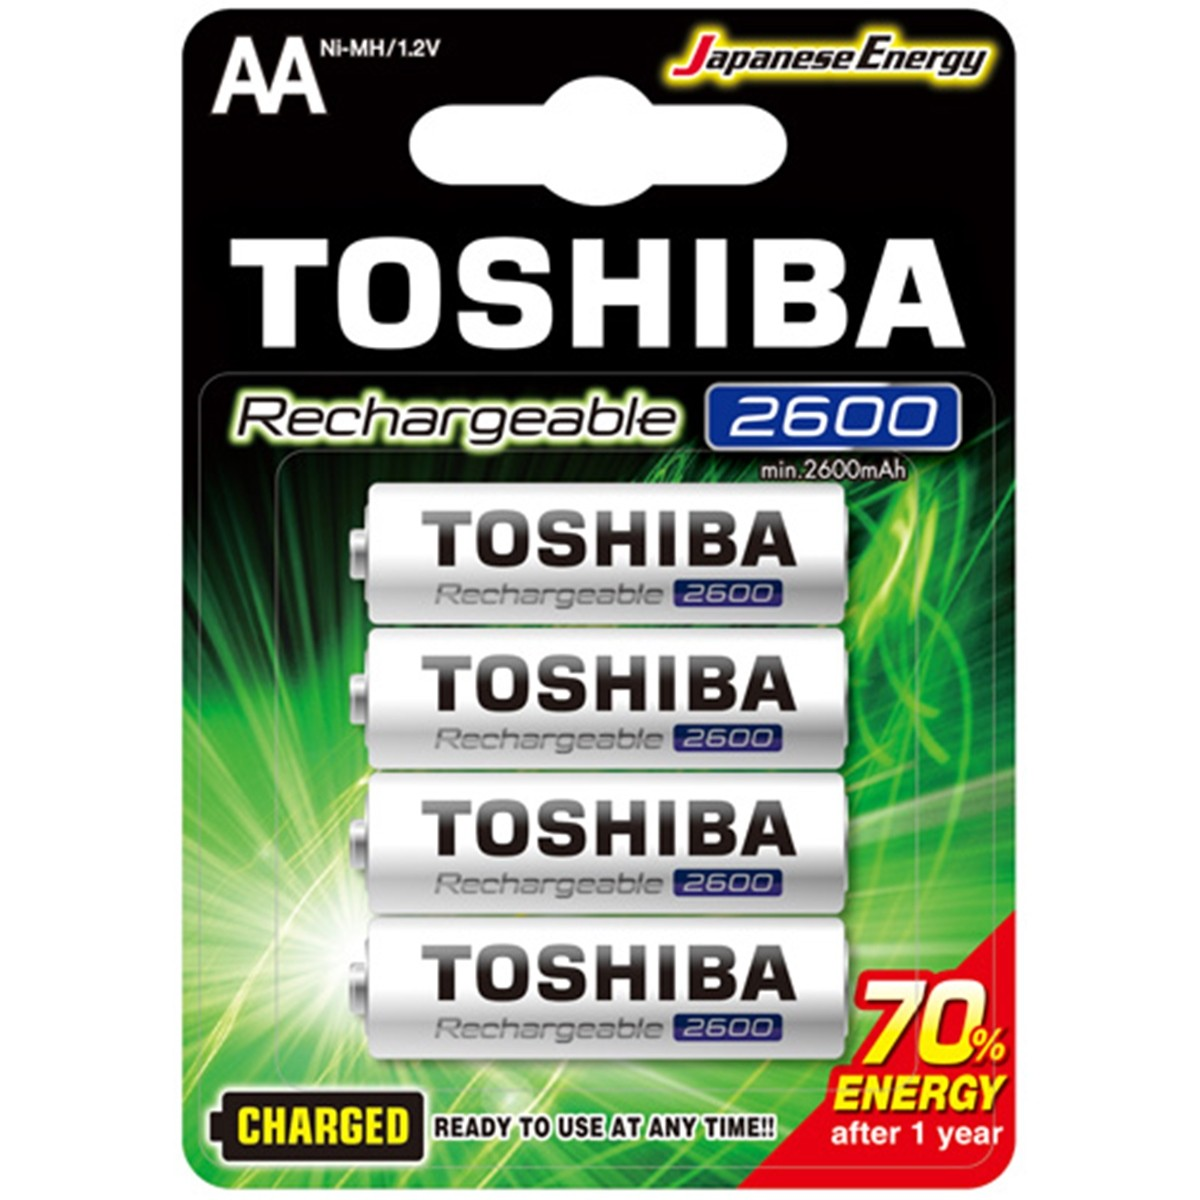 4 Pilhas Recarregáveis Toshiba AA Pequena 2600mAh TNH-6GAE BP-4C 1,2v